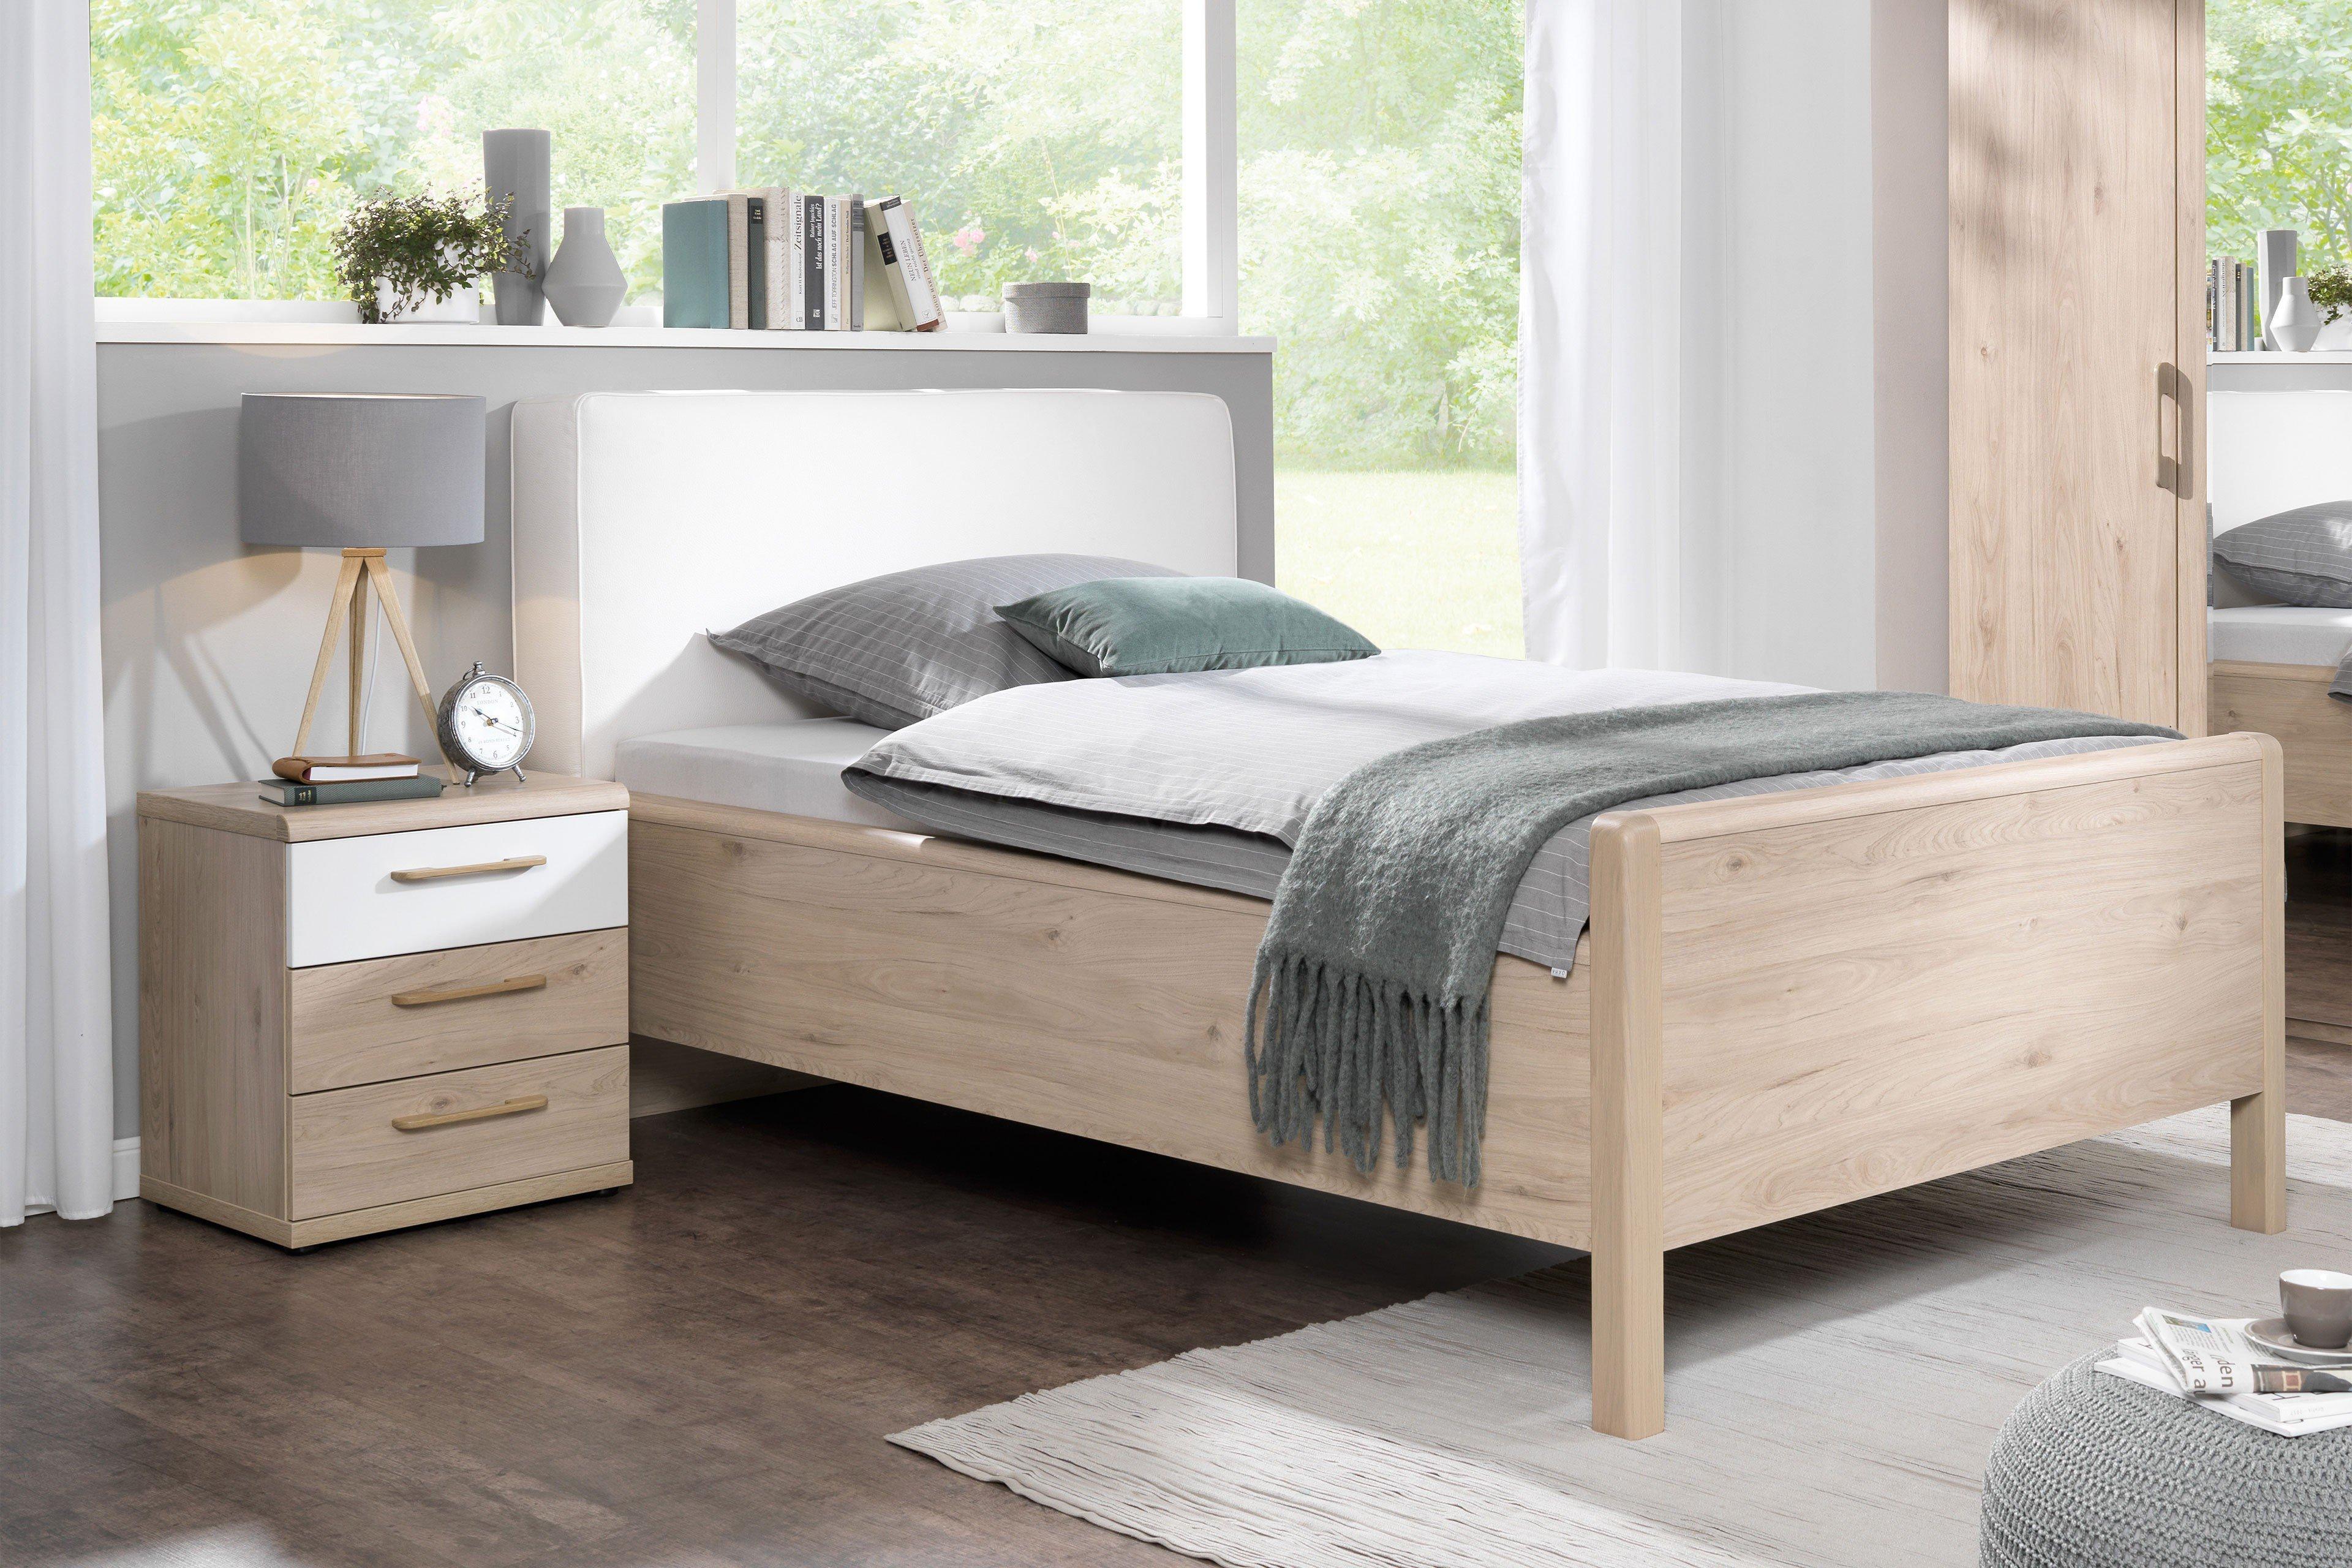 Welle Ageless Living Bett Mit Komforthohe Mobel Letz Ihr Online Shop